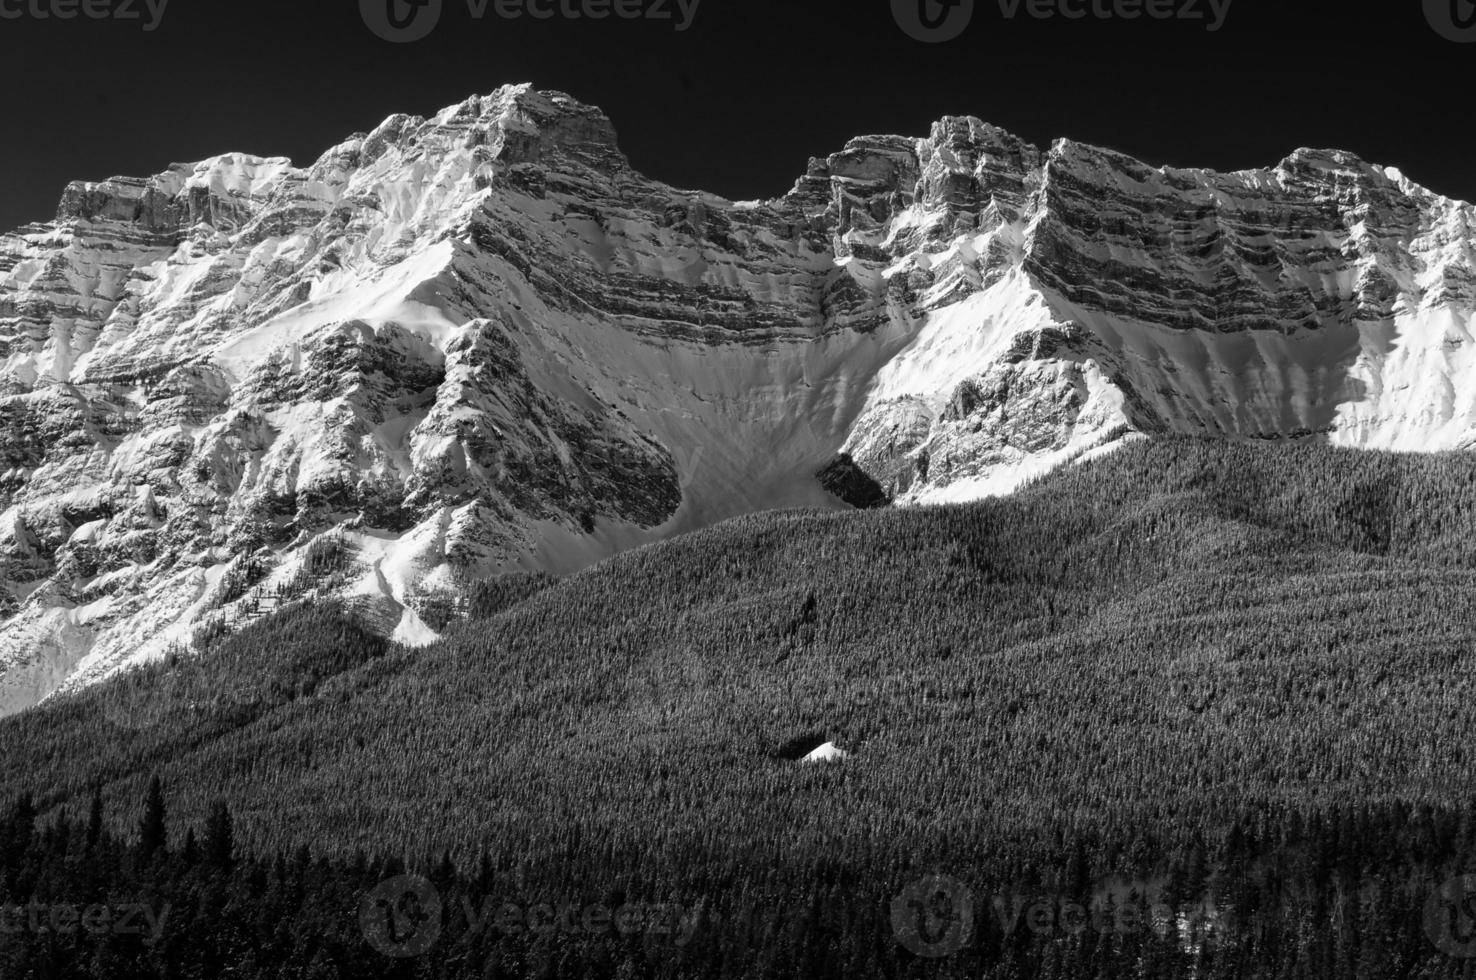 cascade berg, banff park winter foto